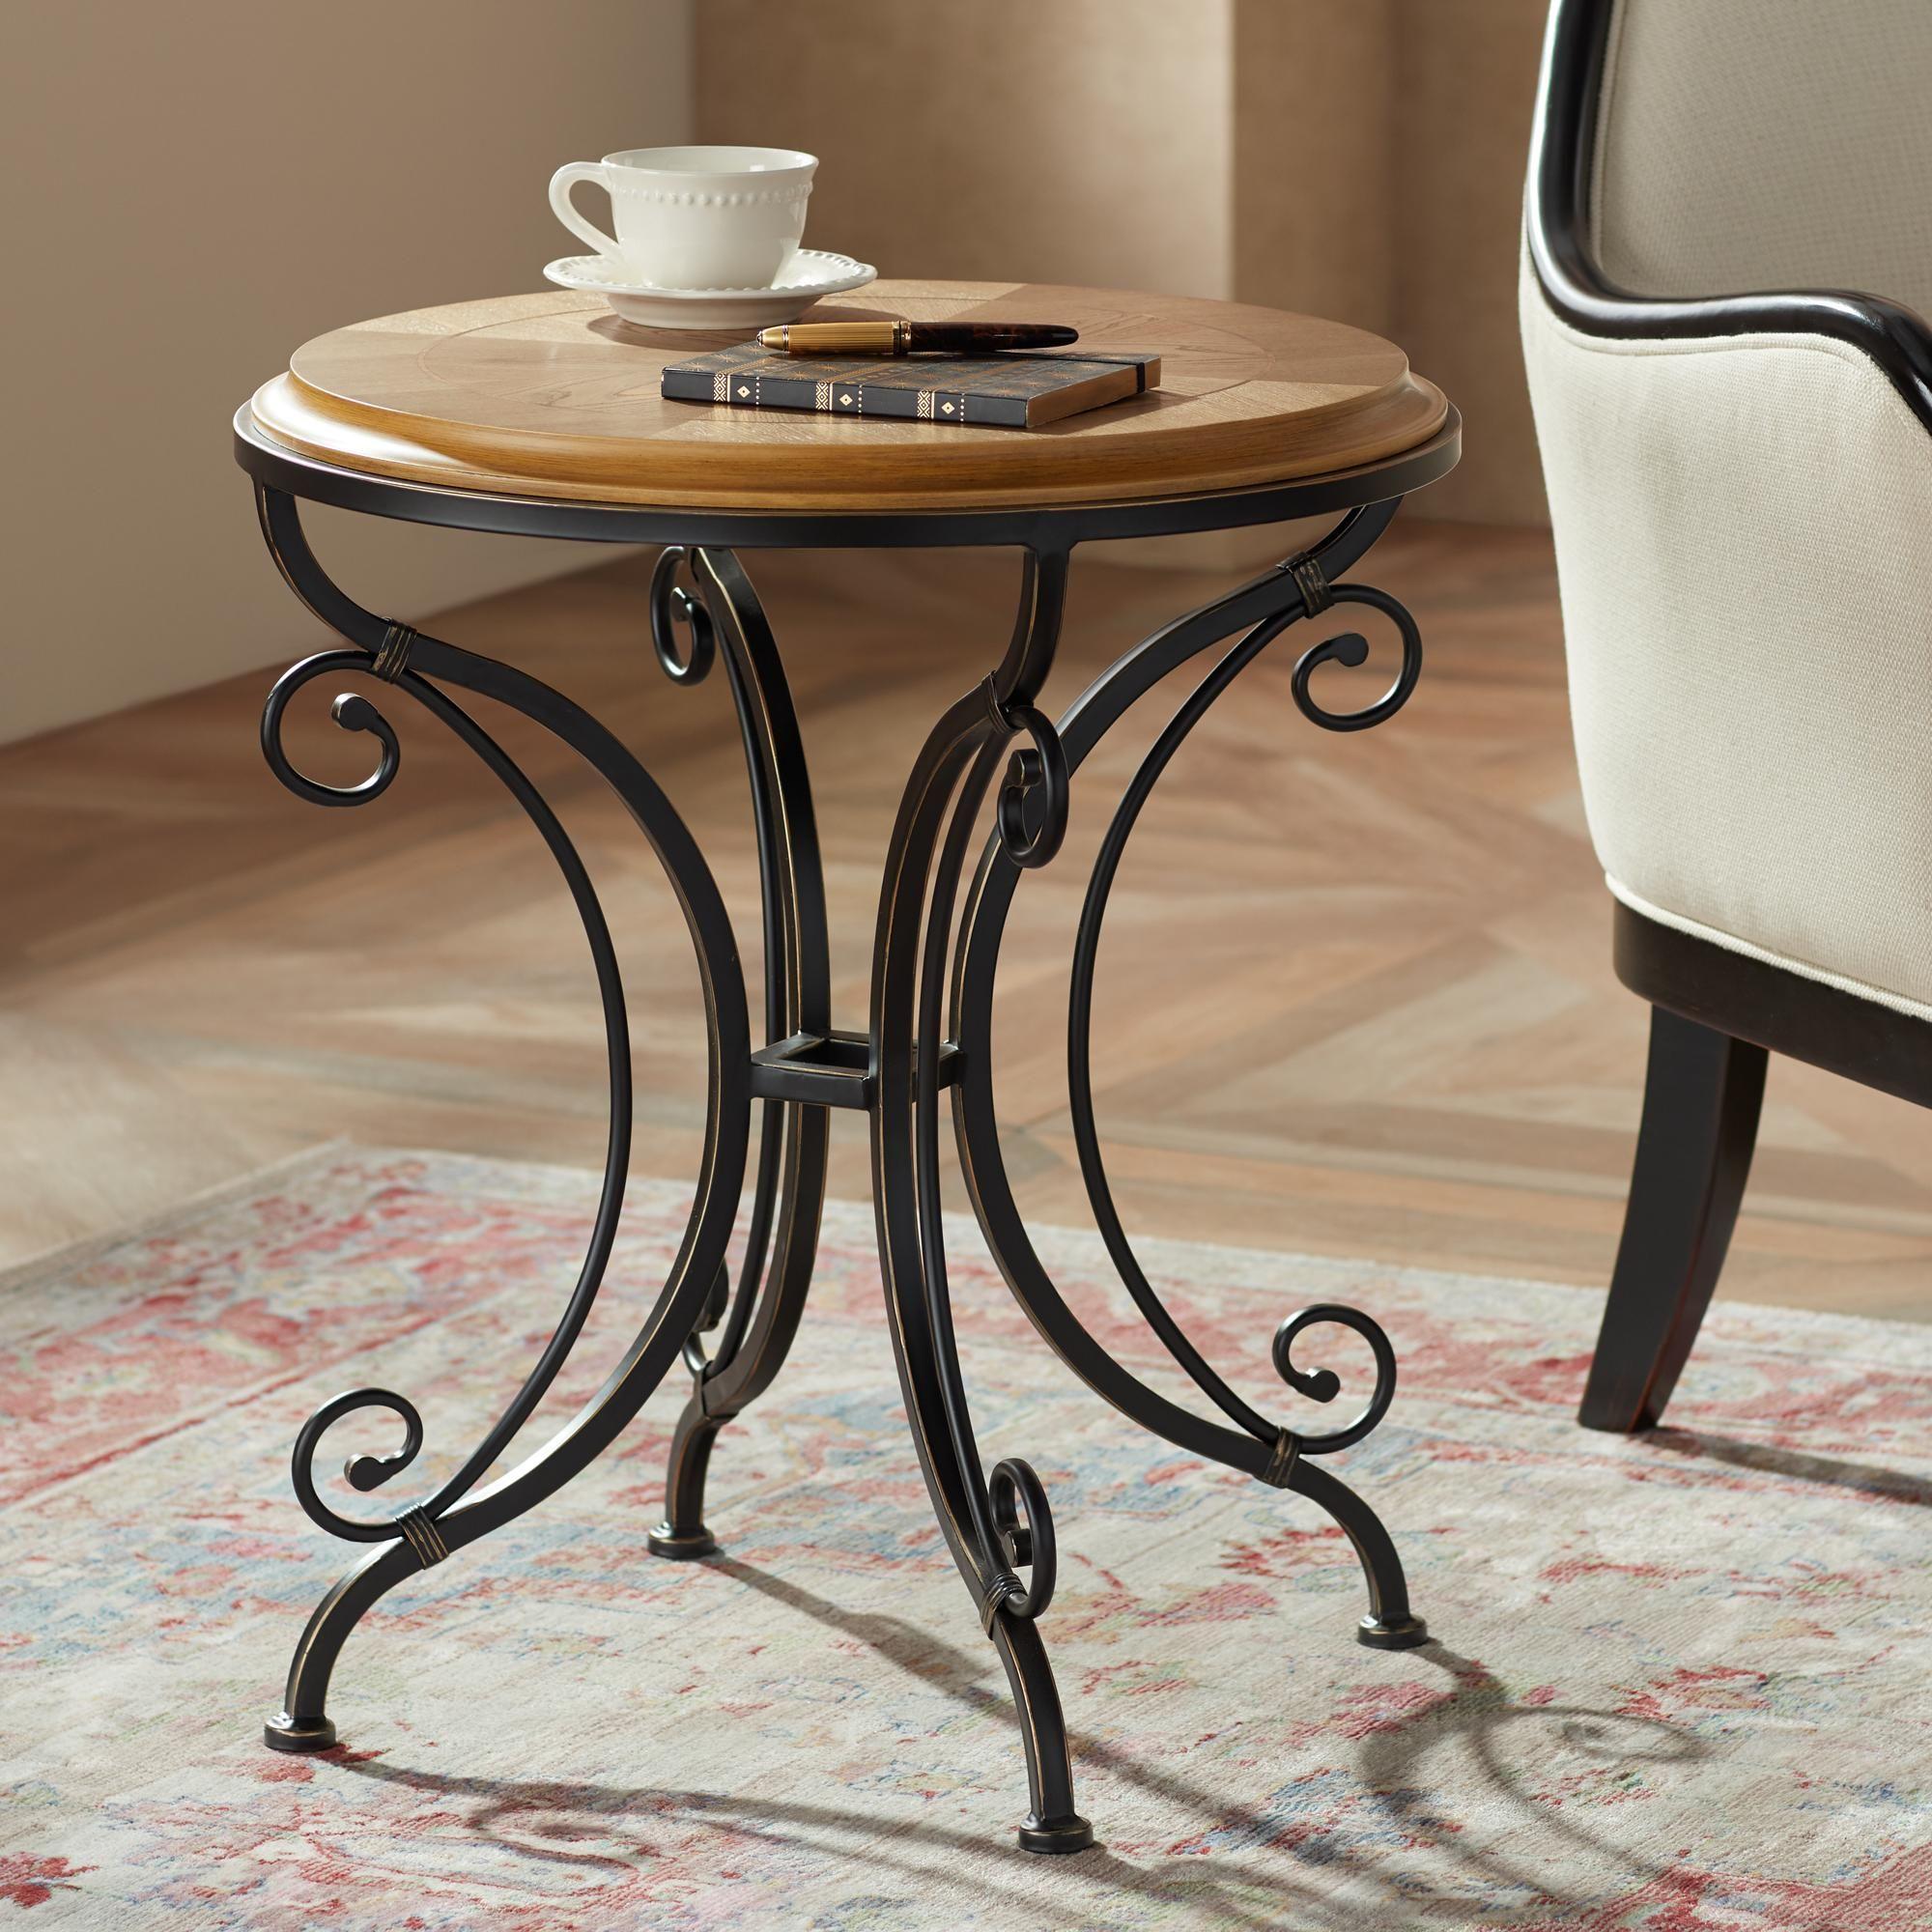 Tables Leda 22 1 4 Wide Gold Brushed Black Round Accent Table Round Accent Table Accent Table Black Accent Table [ 2000 x 2000 Pixel ]